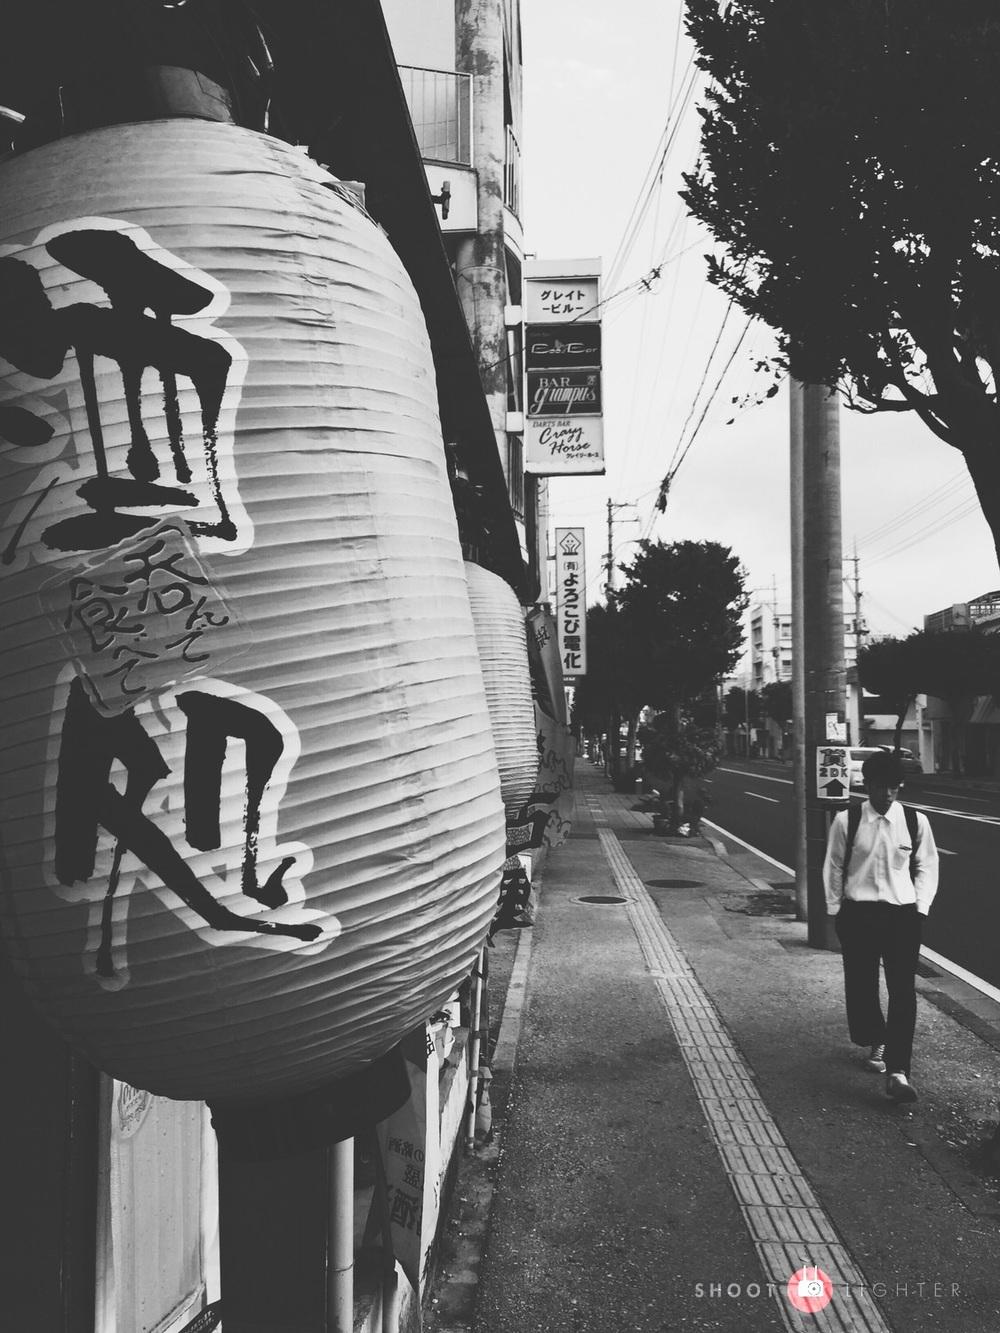 Okinawa City, Okinawa. Fuji X-Pro1, 18-55mm f/2.8-4. Edited in VSCO Cam and Lightroom Mobile on my iPad Air.